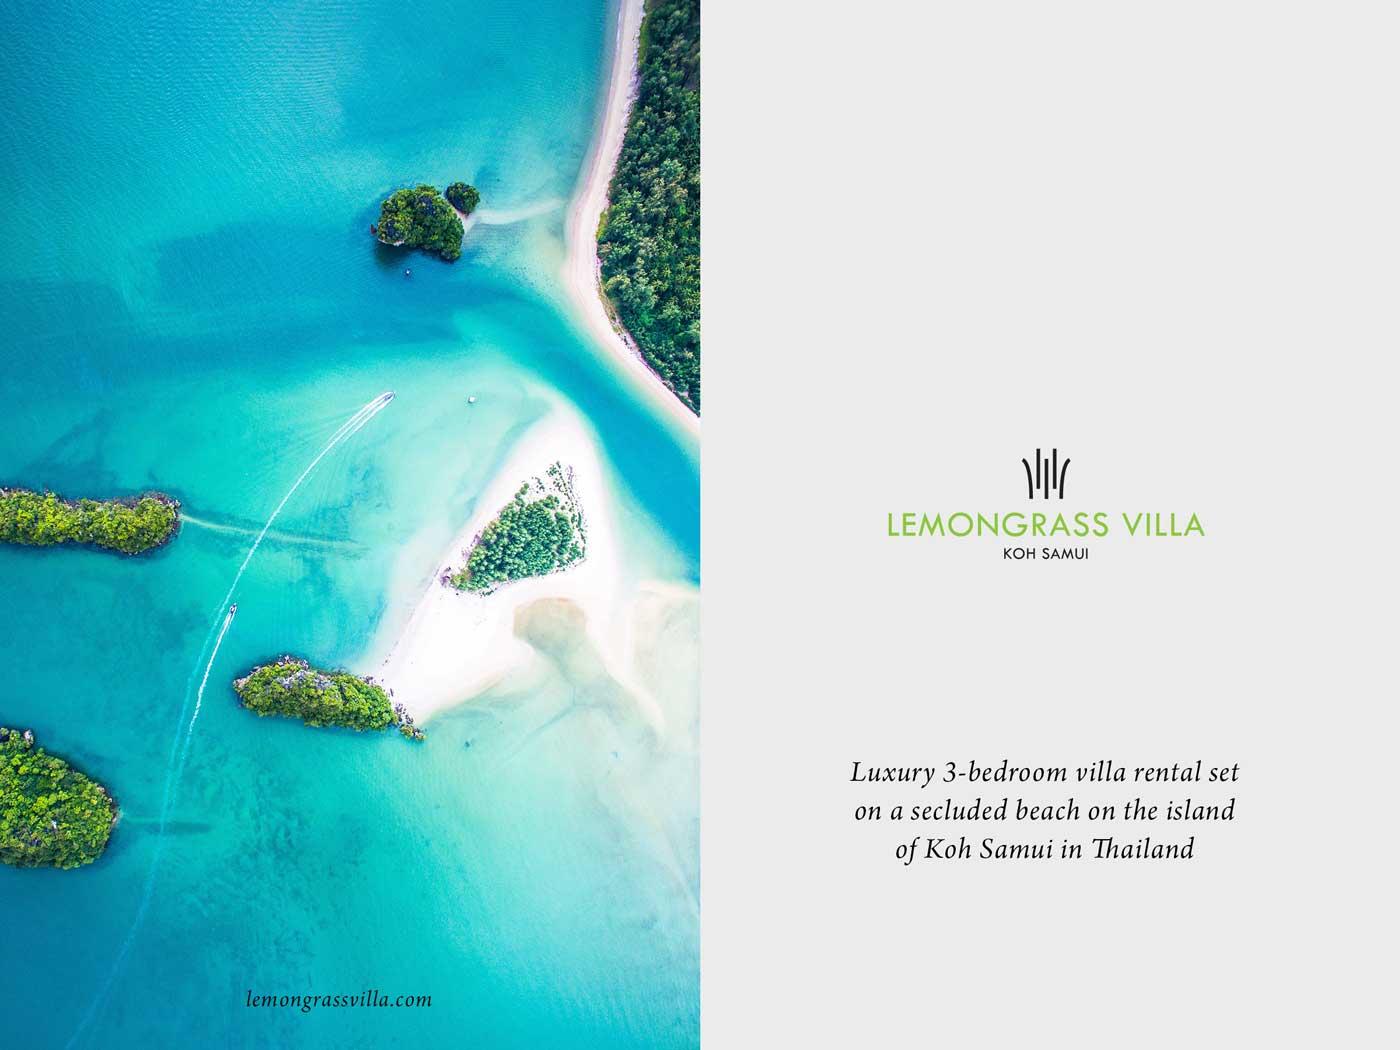 Lemongrassvilla-Koh-Samui-Campaign-June-2017.jpg